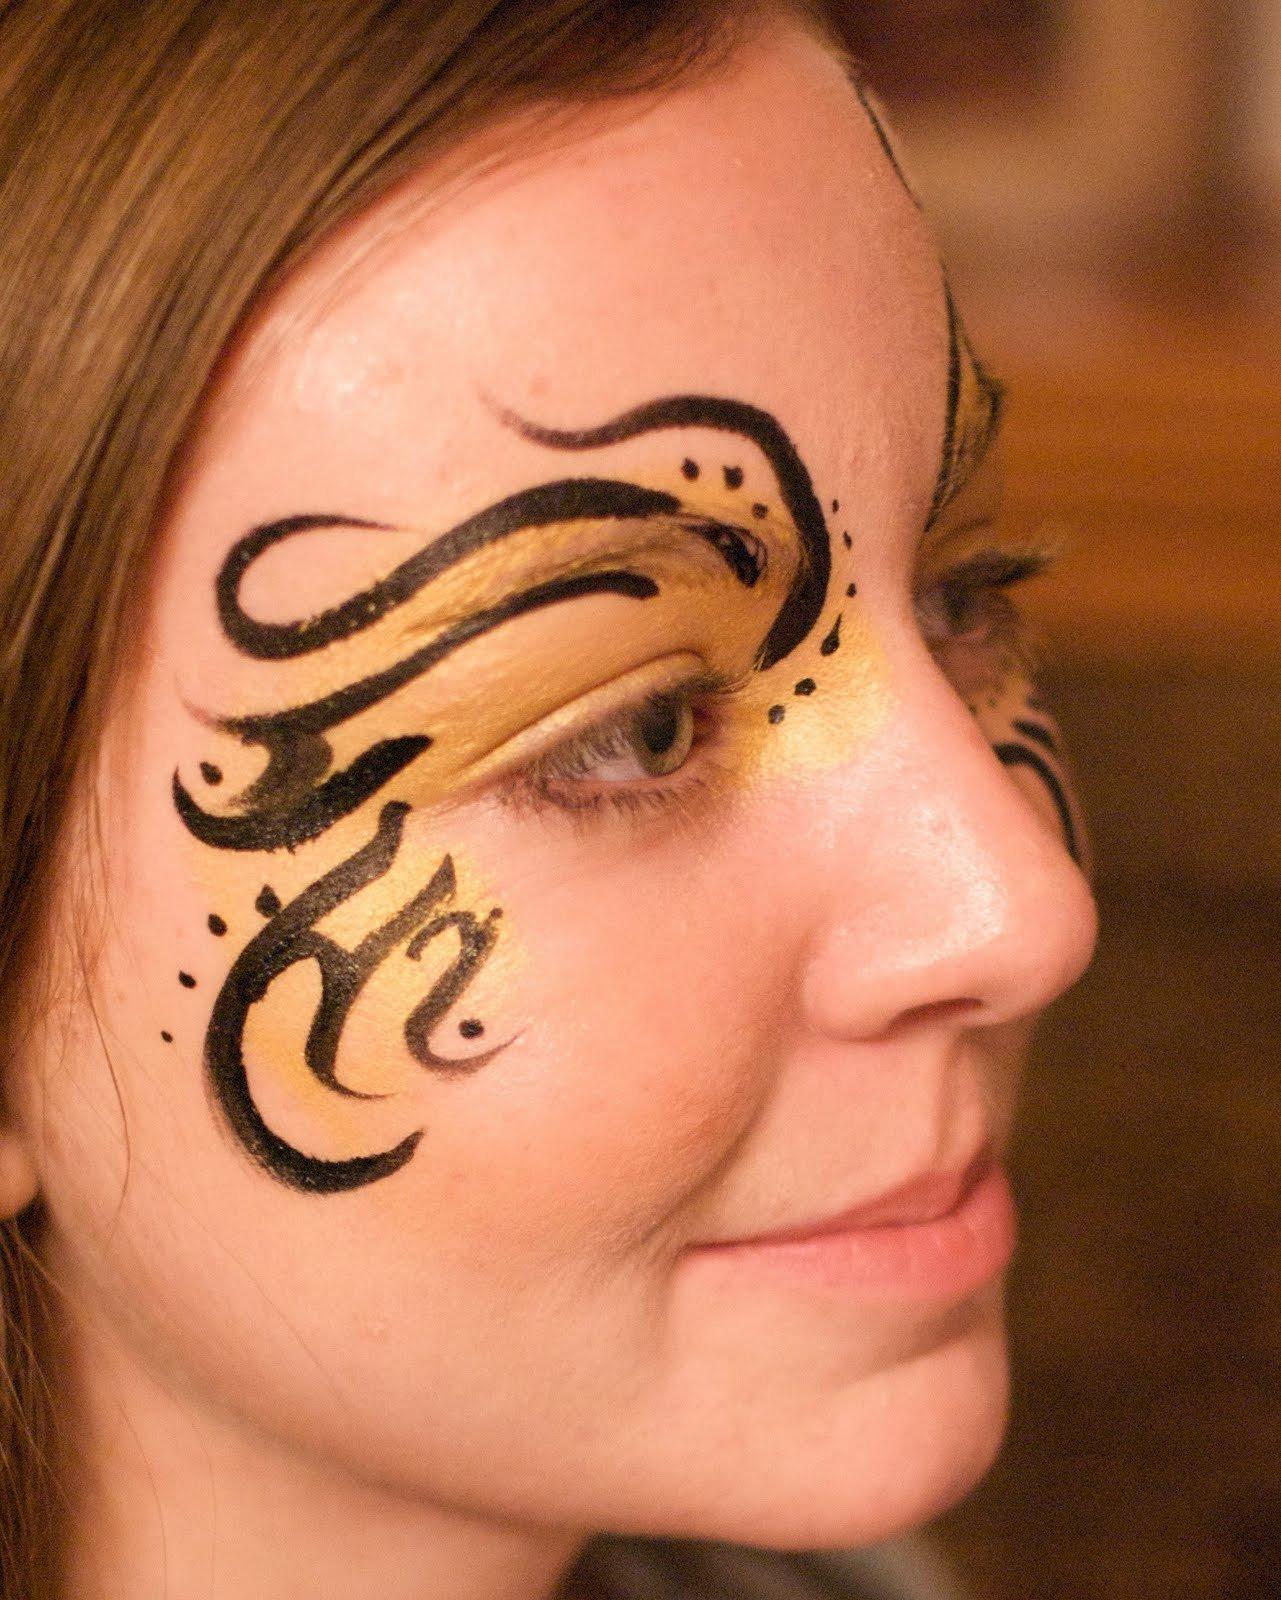 10 Wonderful Mardi Gras Face Painting Ideas face painting illusions and balloon art llc mardi gras masks face 2020